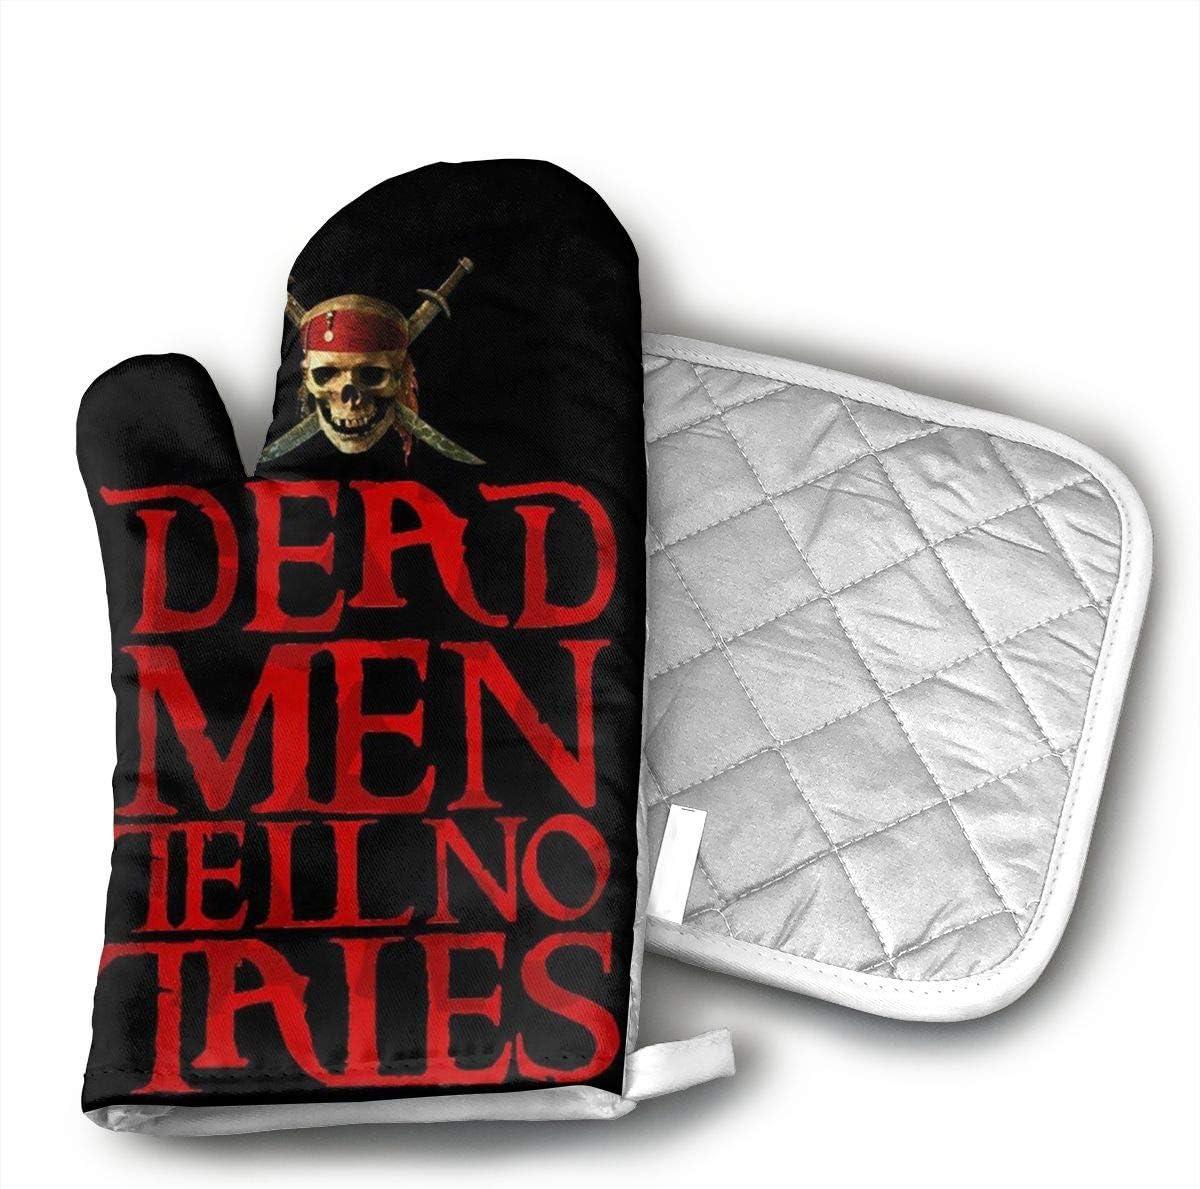 YUHUJUKU Pirates of The Caribbean Dead Heat Insulation Gloves, A Glove,a Heat Insulation Mat.(1.6 Inches Thick)